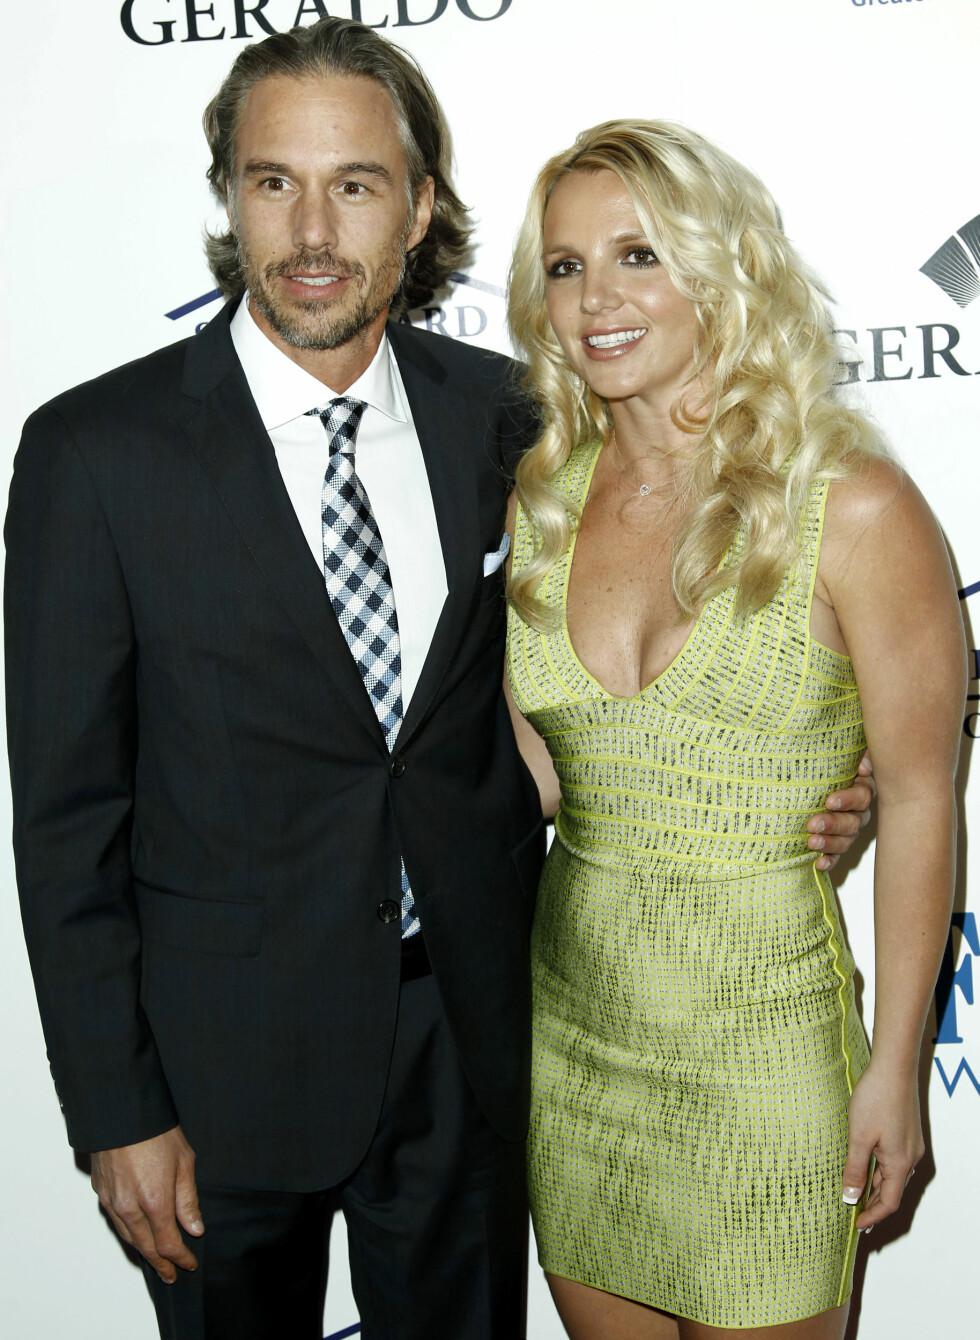 2011: Jason Trawick (43) og Britney Spears (33). Foto: Ap